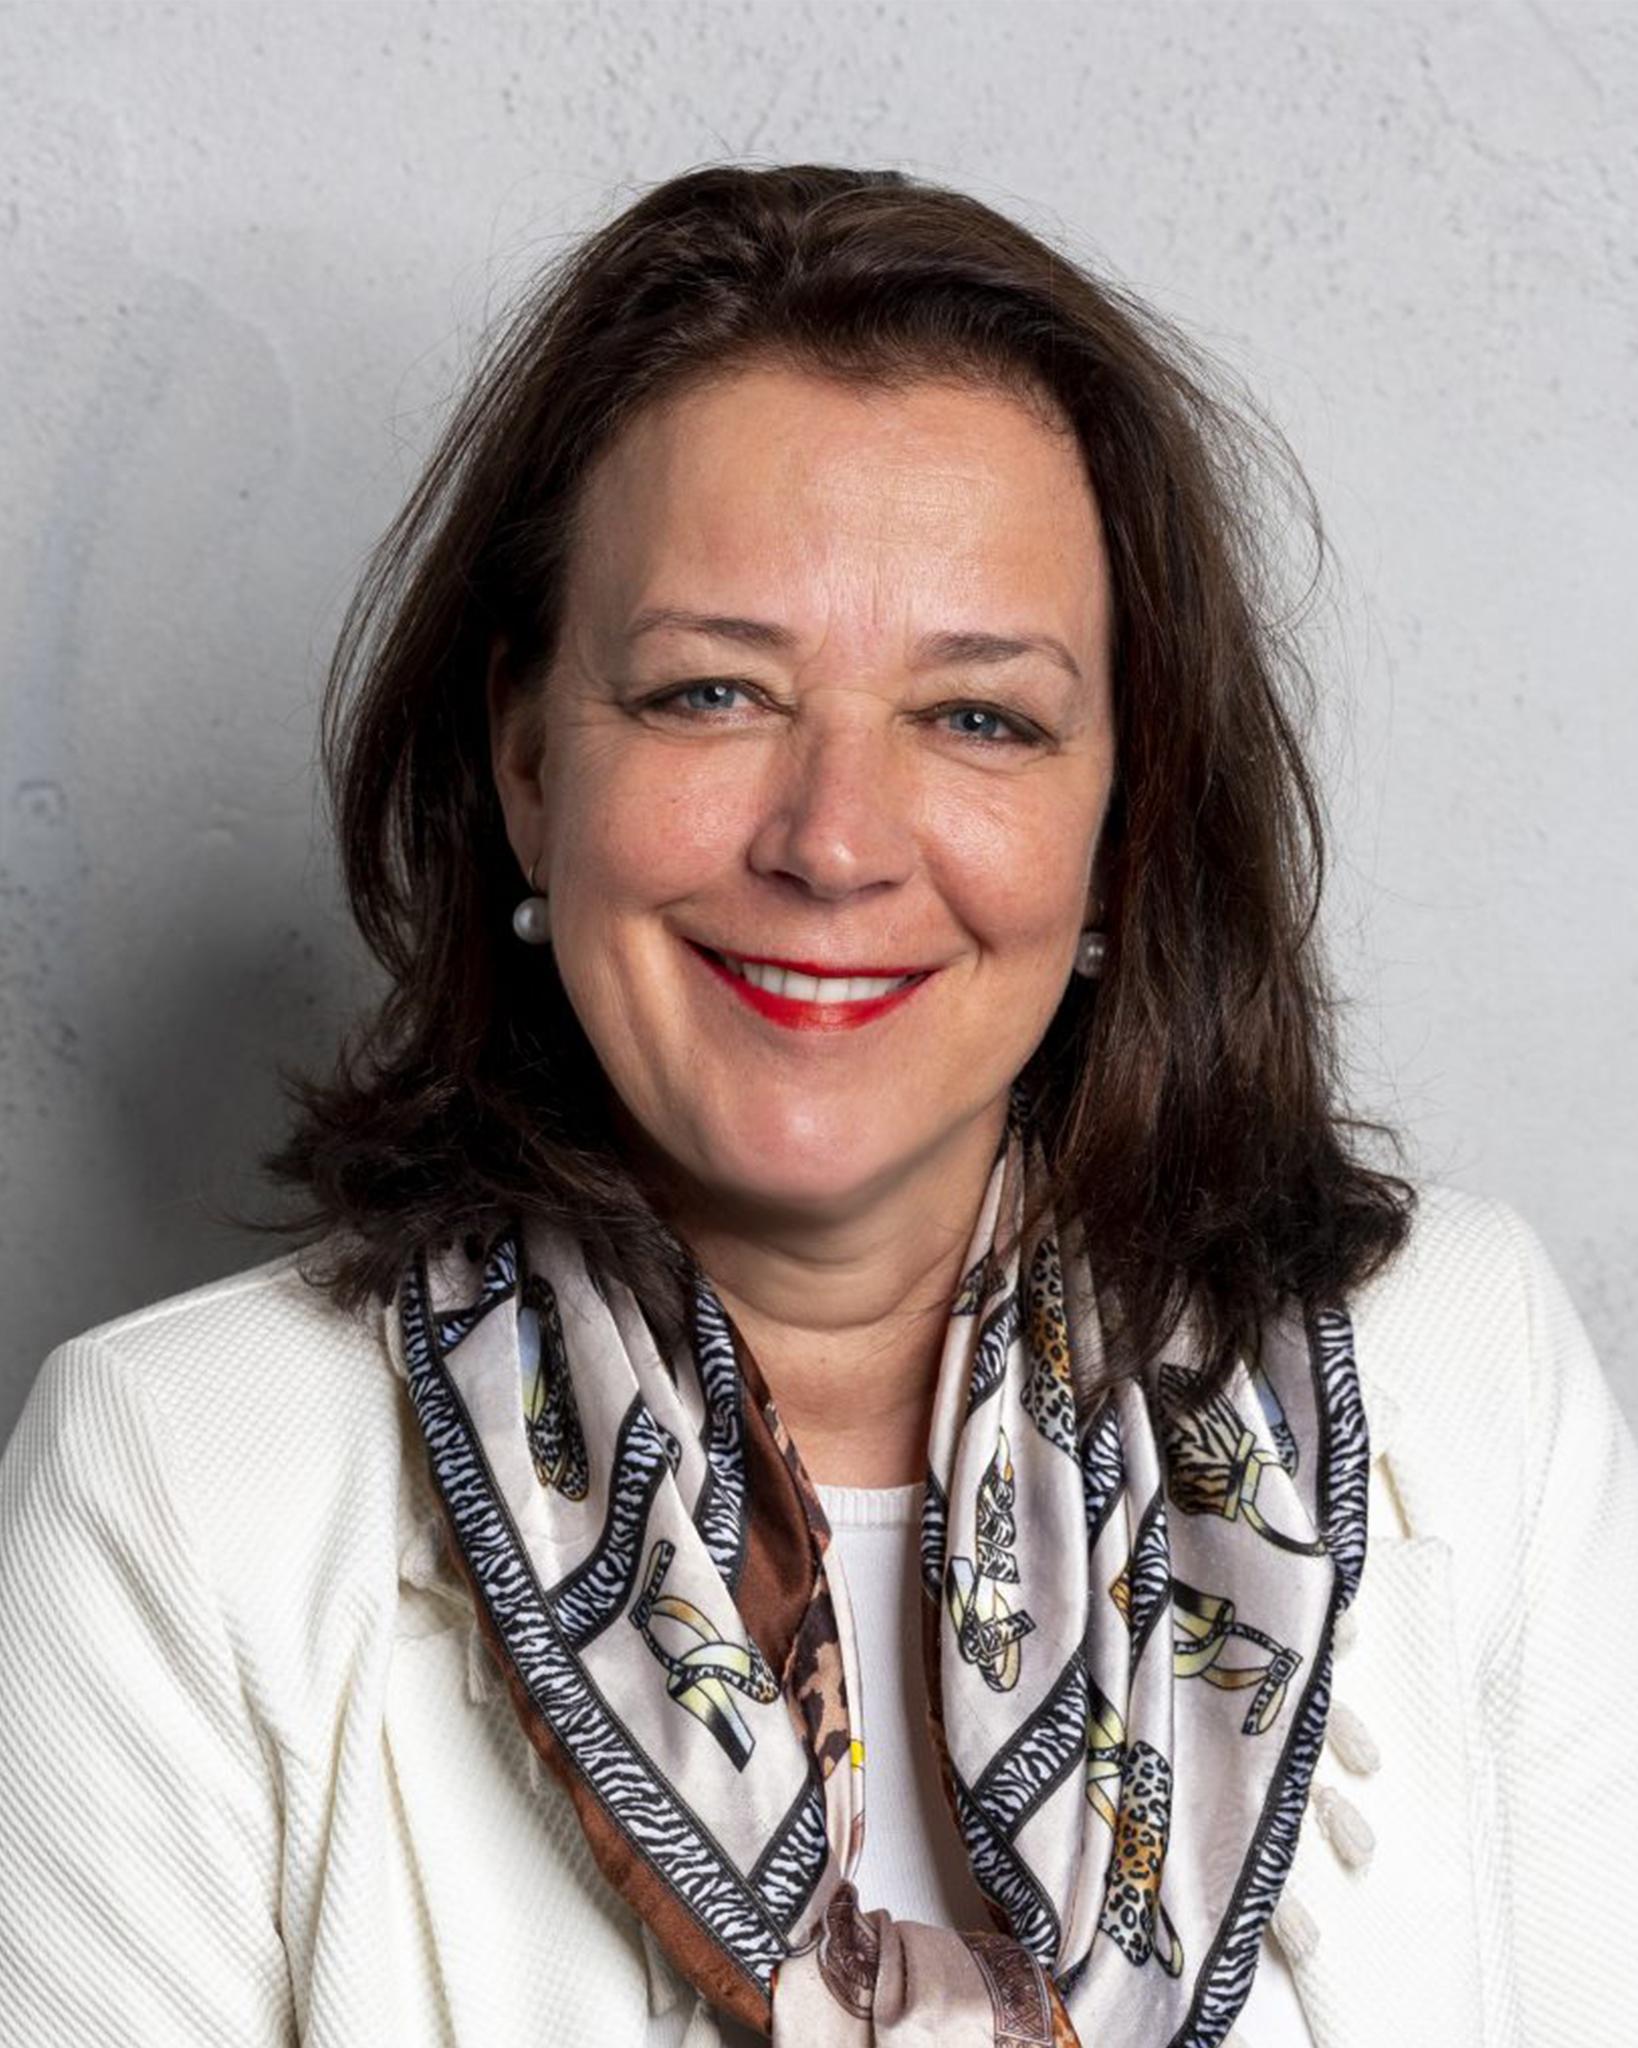 Anne-Lies van Heun-Metscher